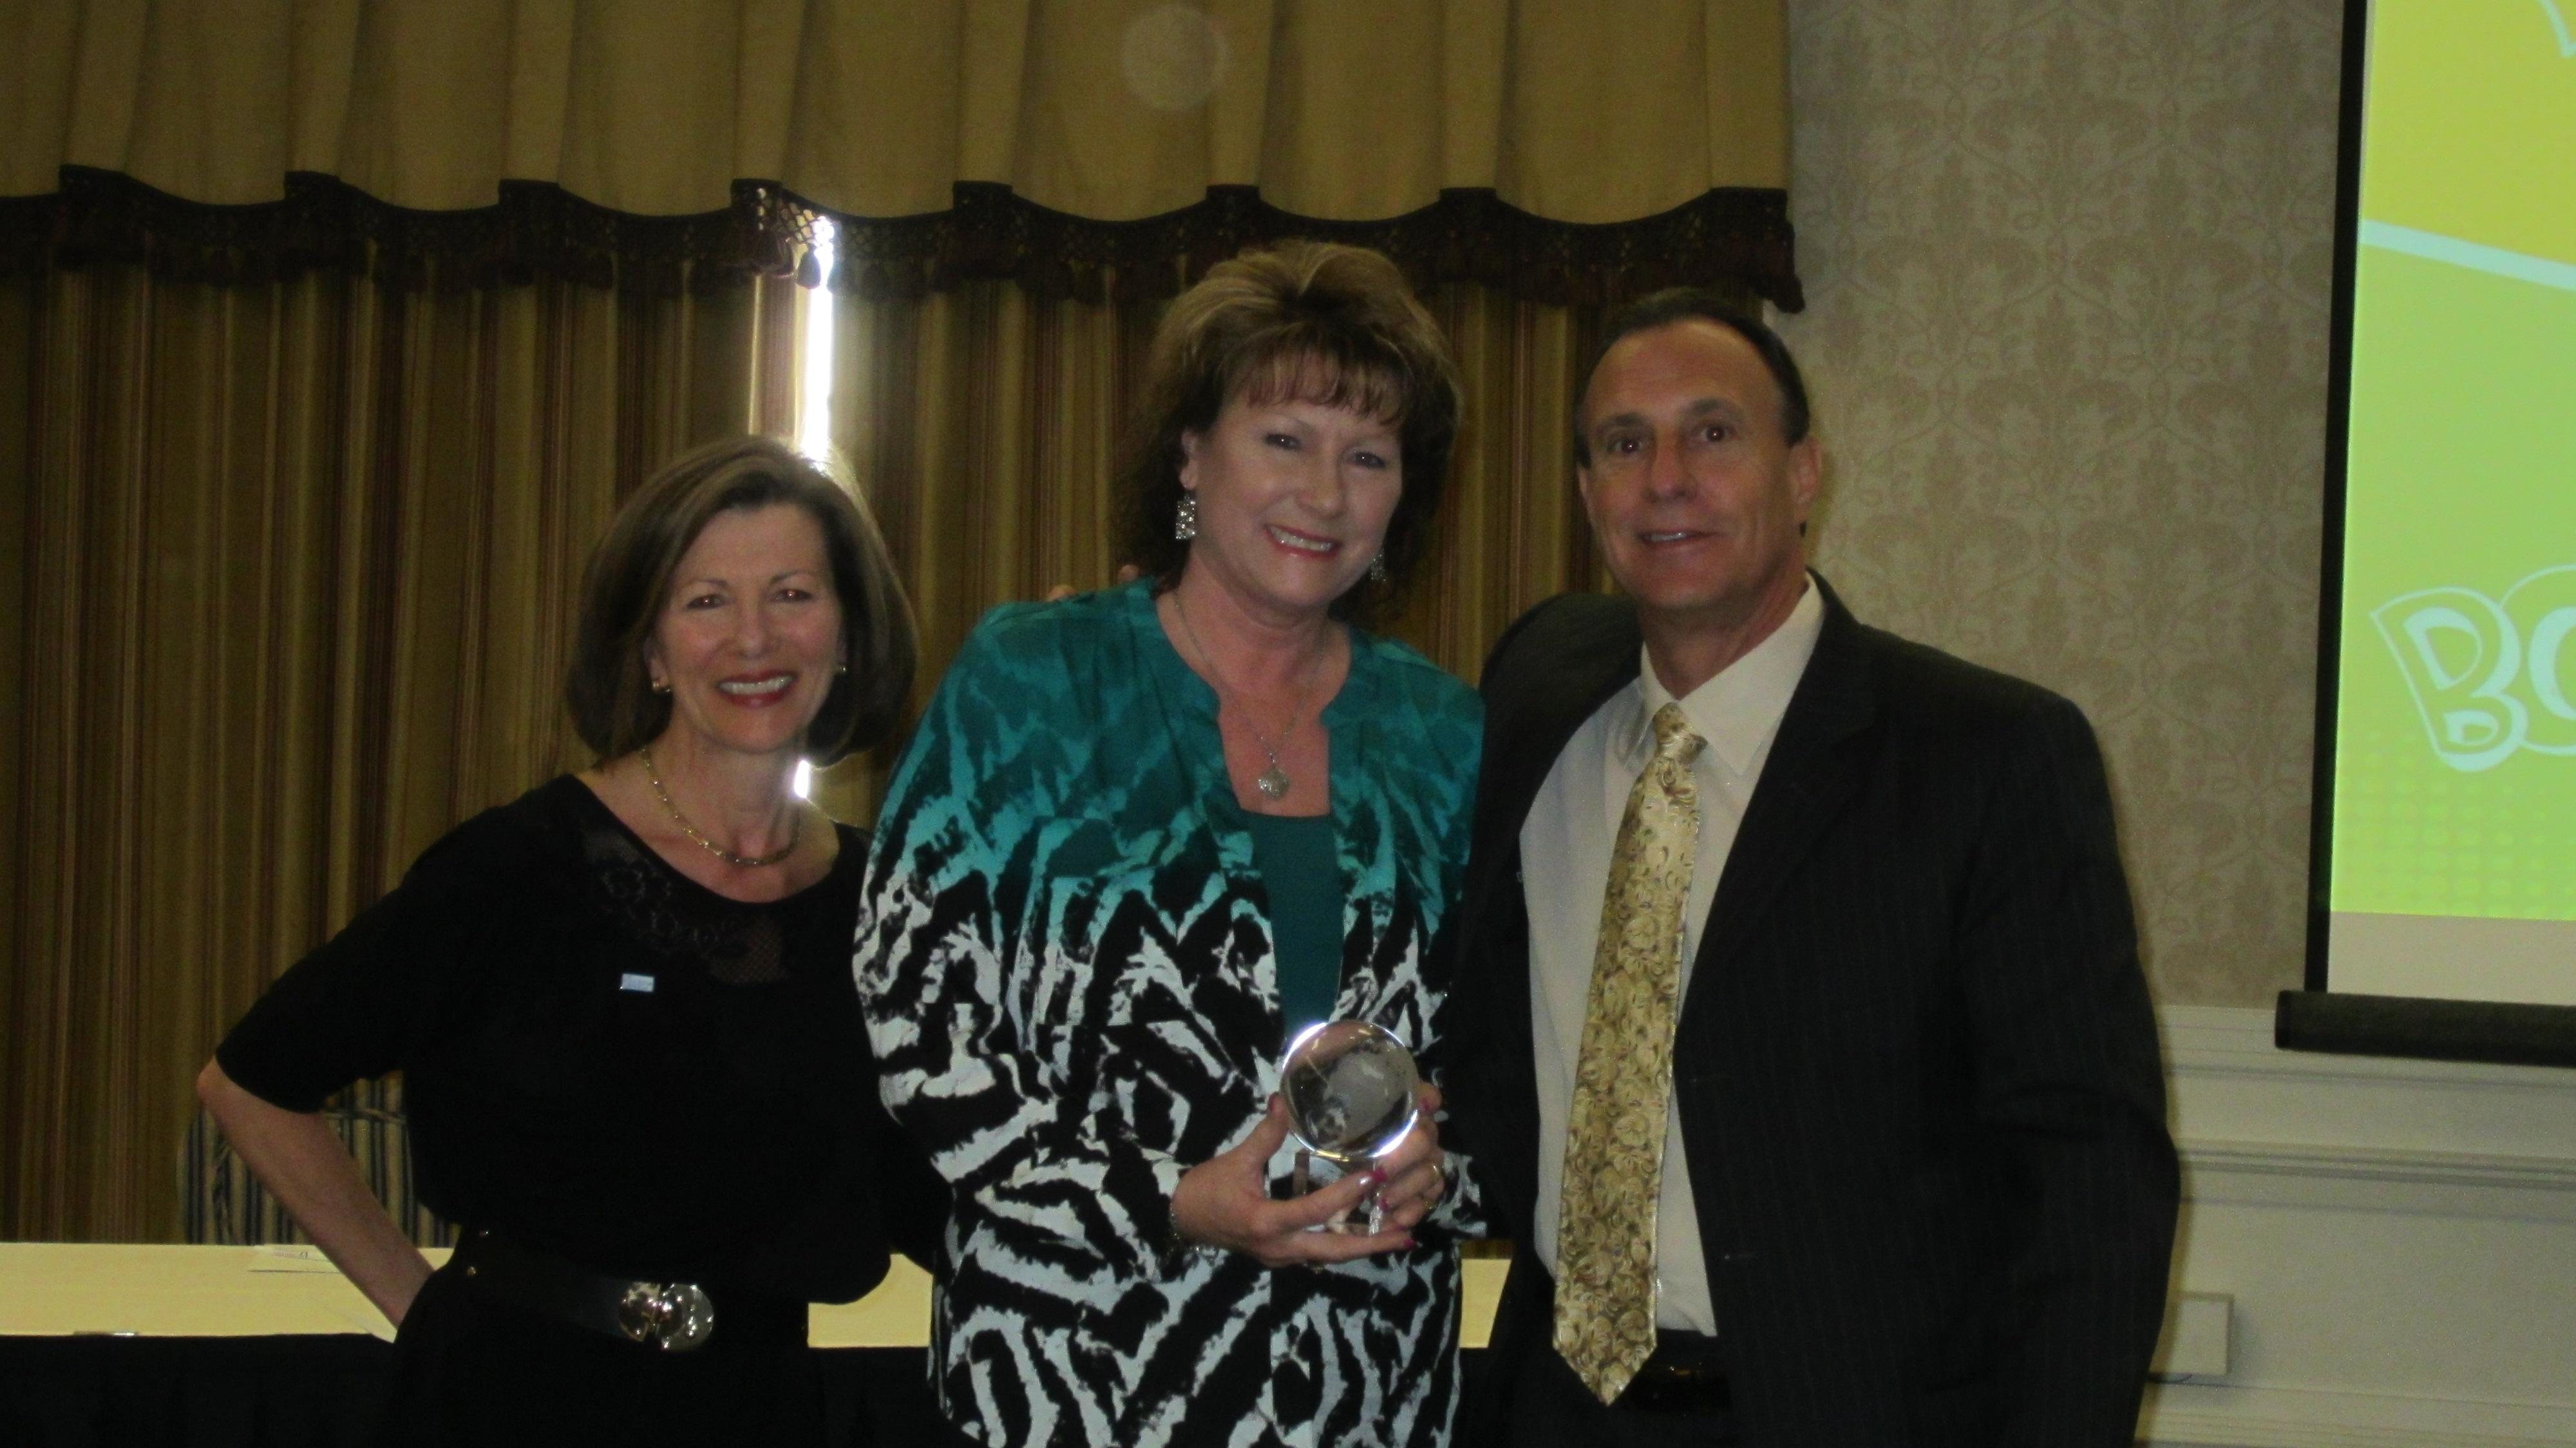 Kirschner Groups Shares News of Success and Awards